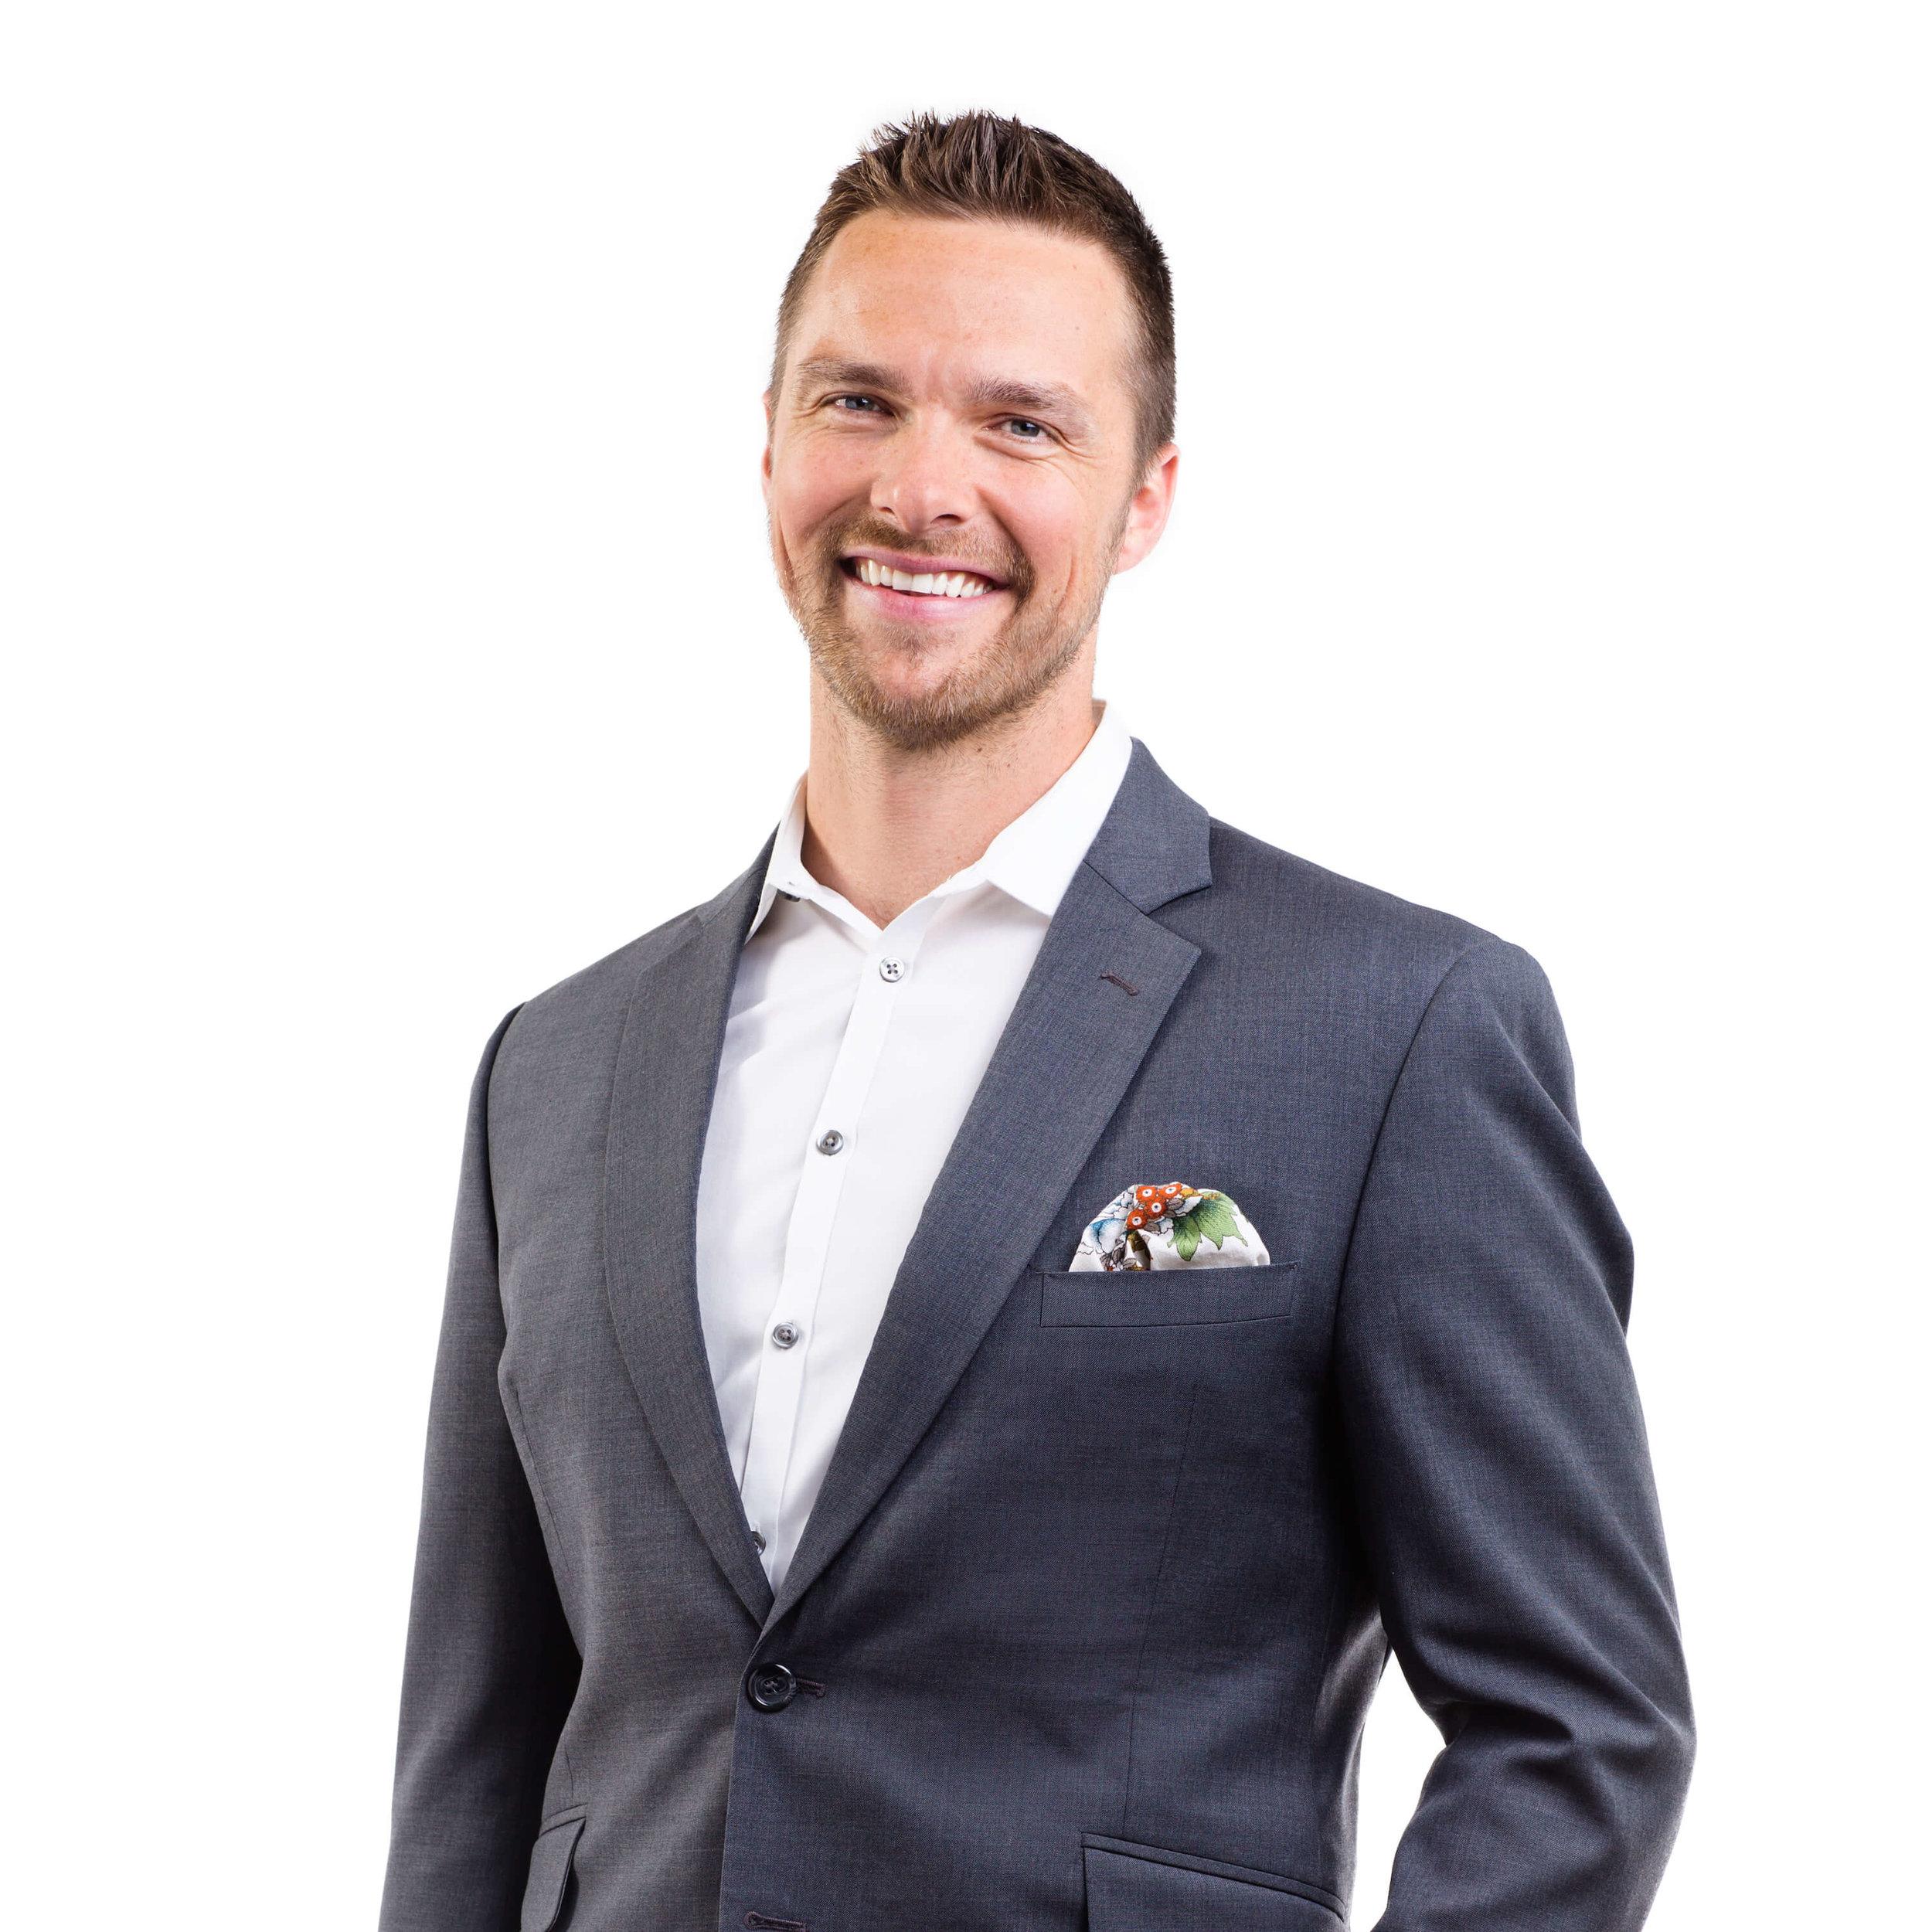 Michael Montgomery - Rev Real Estate School, Real Estate Coaching